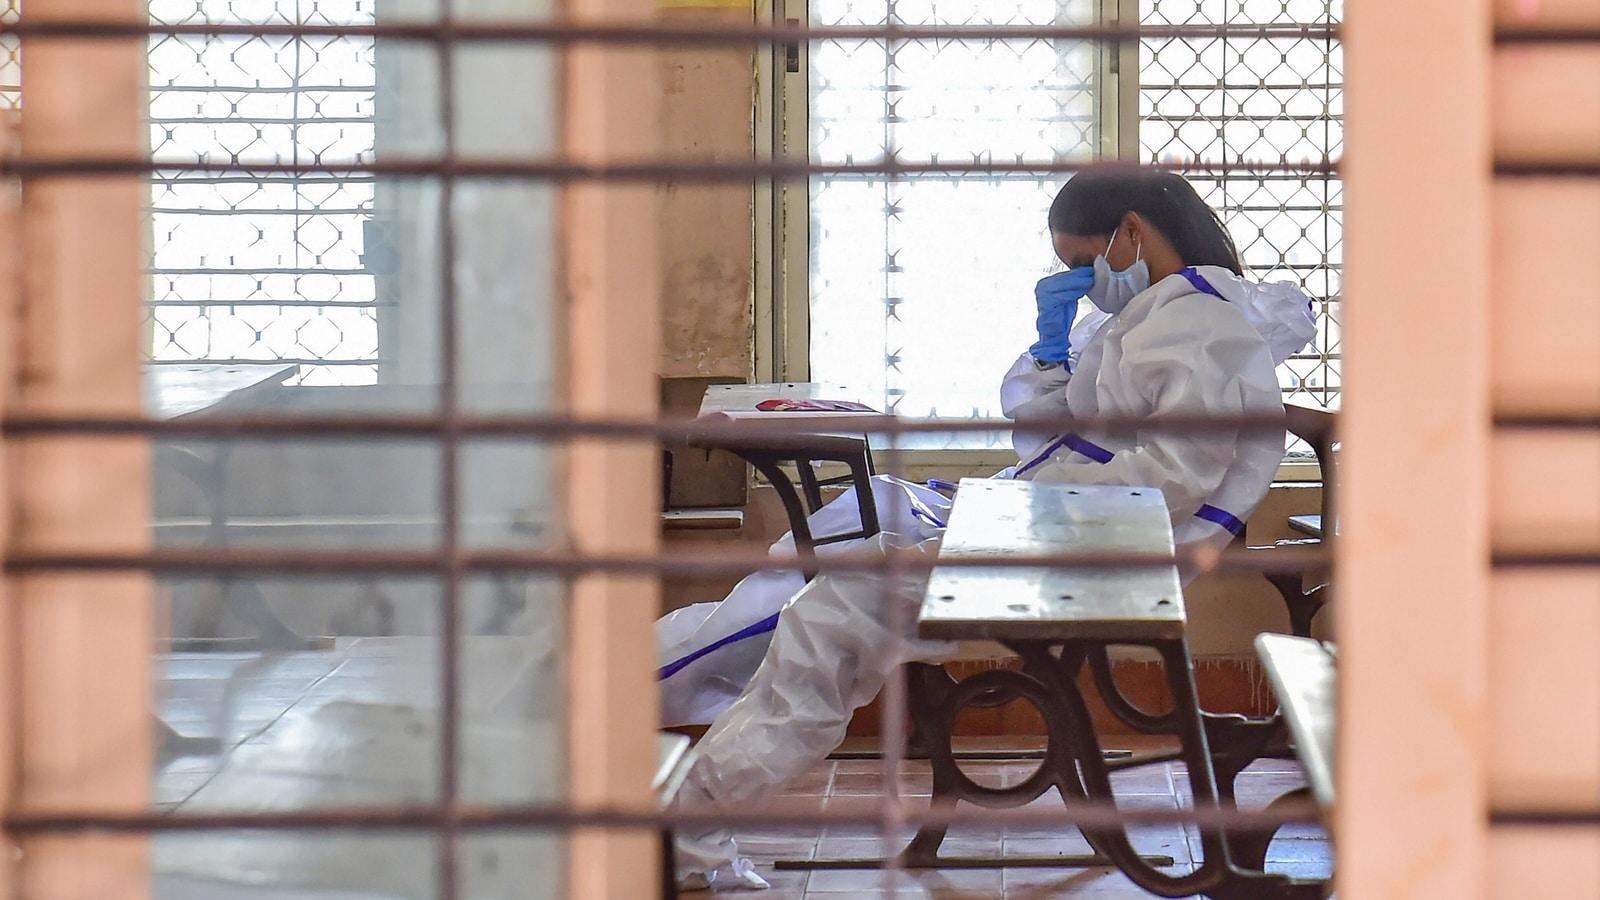 Government School Teachers' Association said over 120 Delhi government school teachers died due to Covid-19 during second wave of coronavirus.